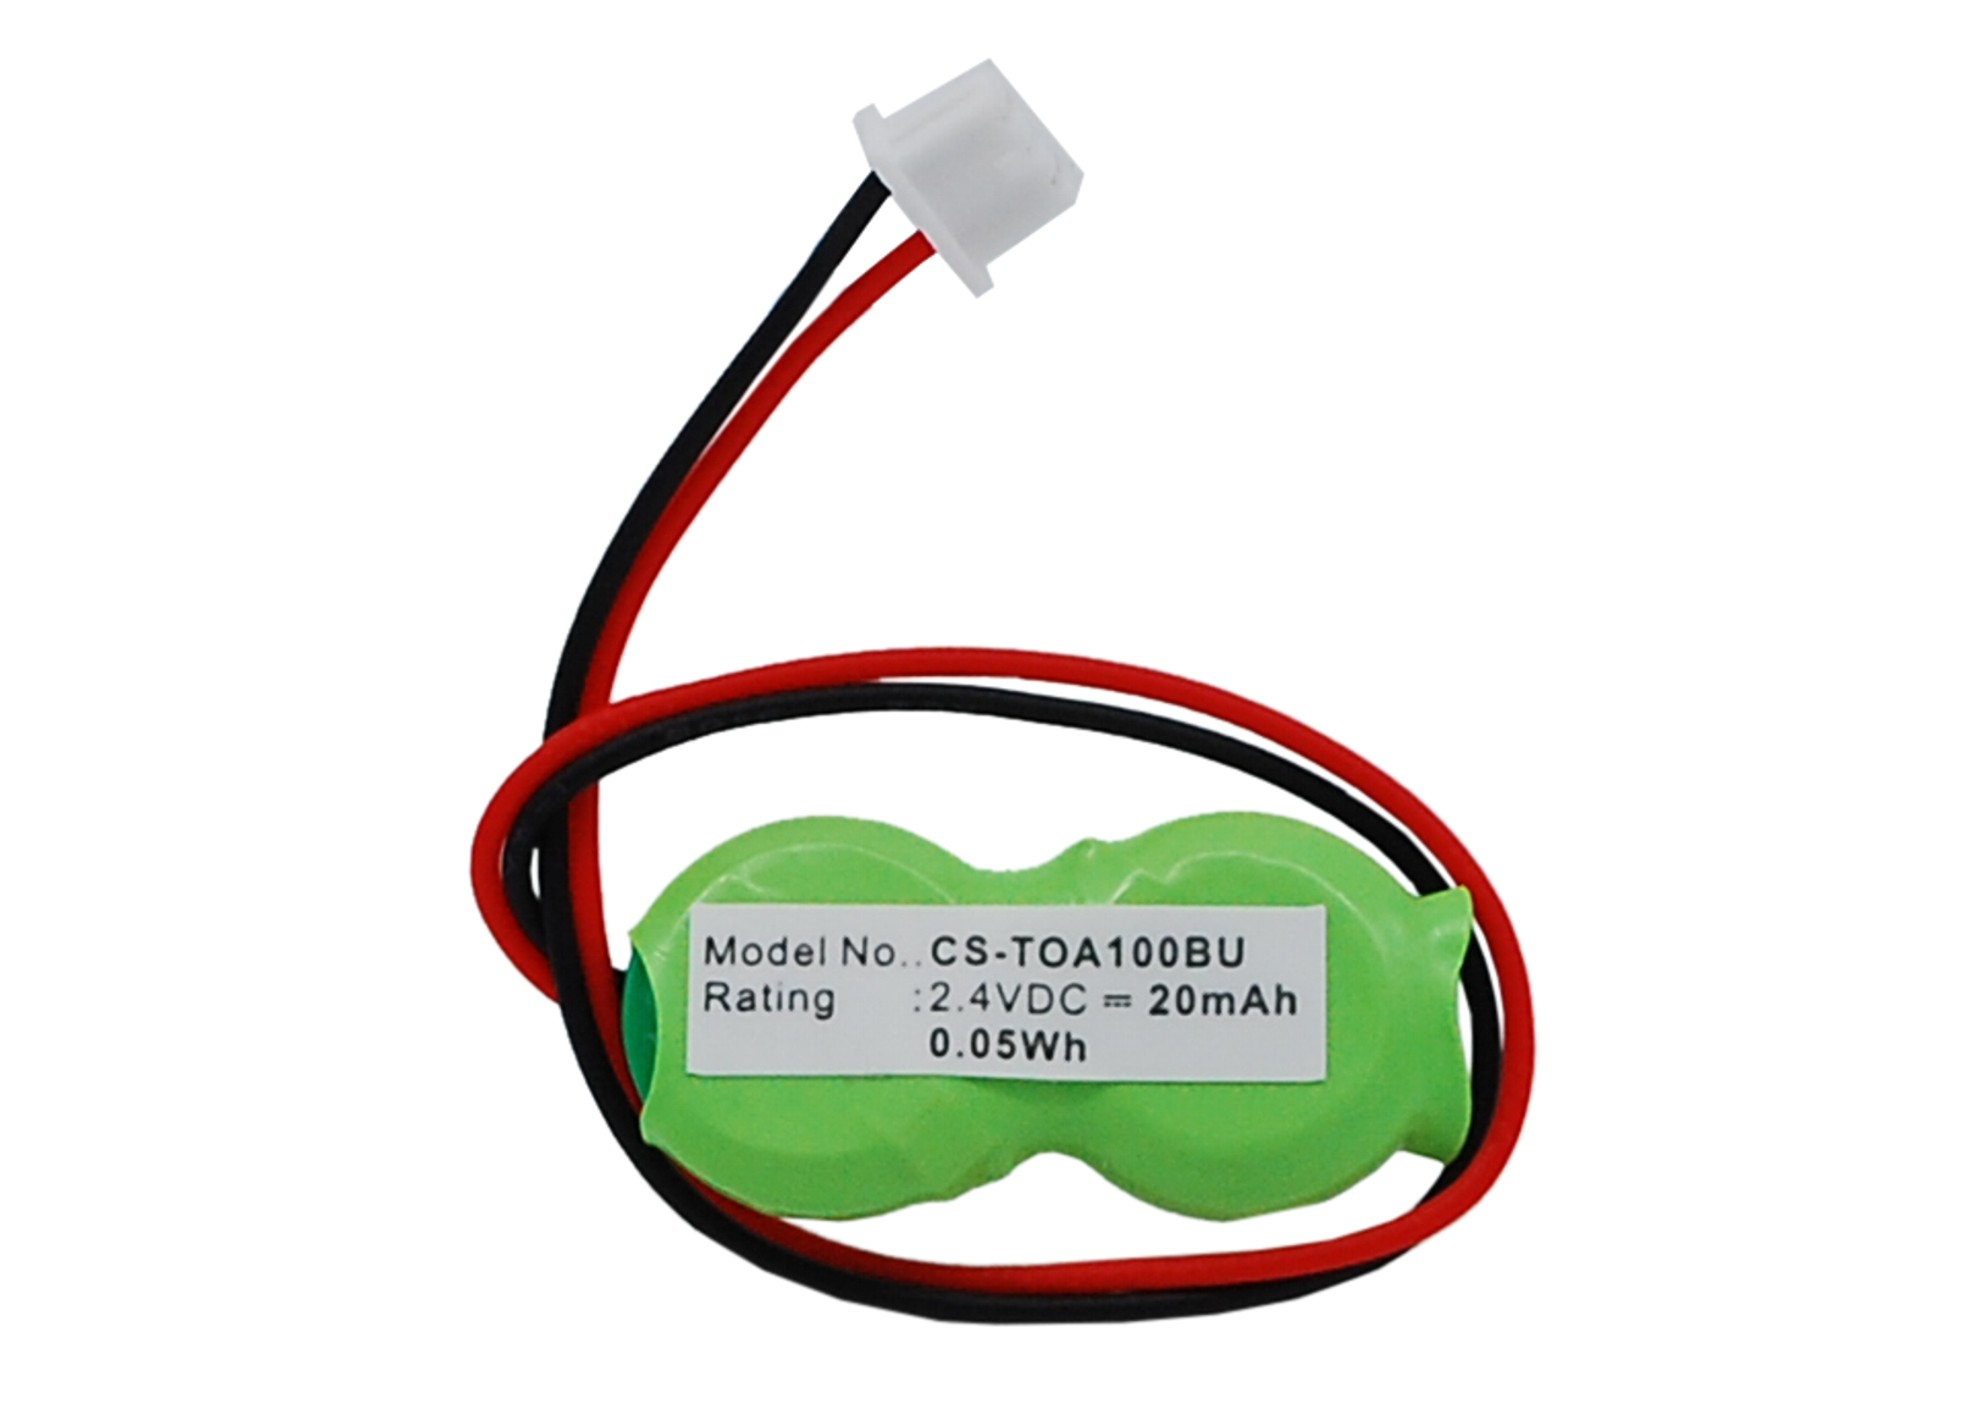 Cameron Sino baterie cmos pro TOSHIBA Portege R600 (PPR65U) 2.4V Ni-MH 20mAh zelená - neoriginální